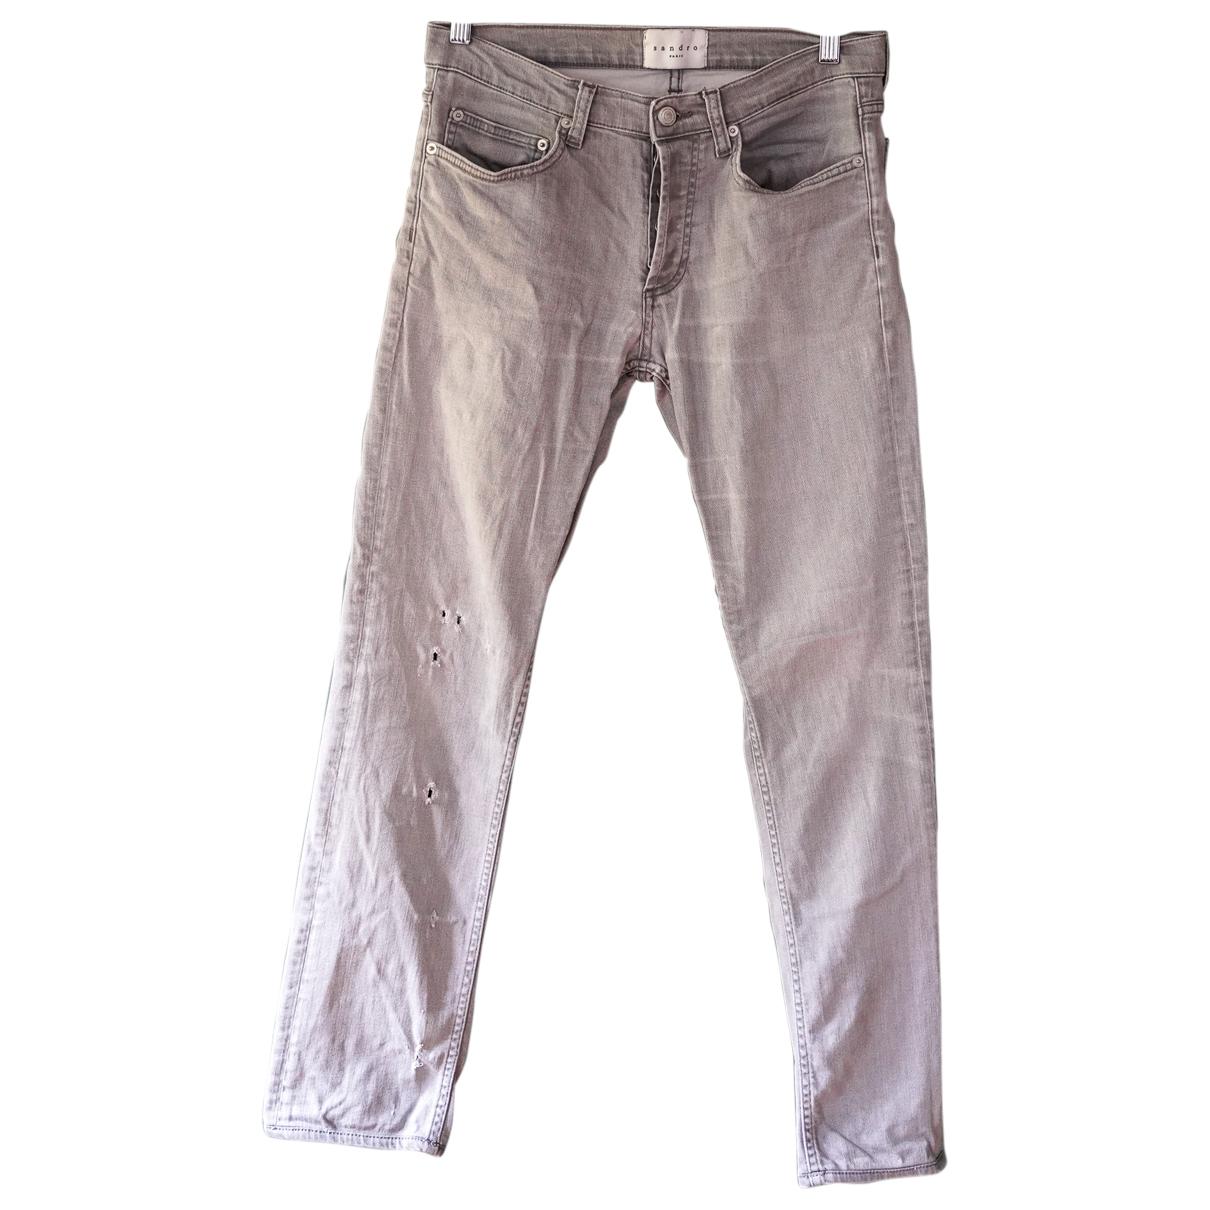 Sandro \N Grey Cotton - elasthane Jeans for Men 30 US